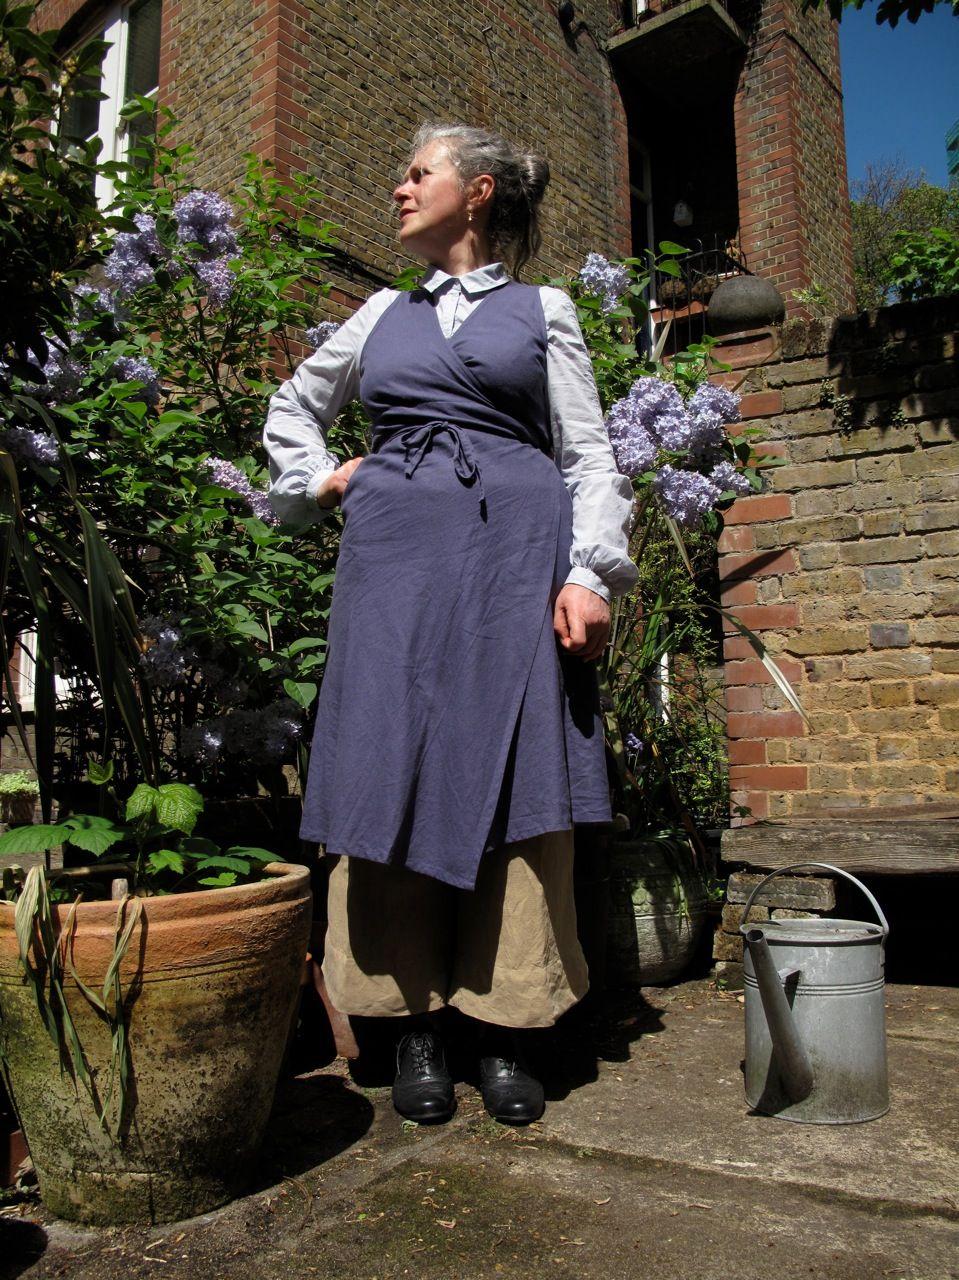 Margaret's Bias cut linen/polyester wrap dress  available Via www.scobelclothing.co.uk or at  Bias Bellenden Rd SE15  o